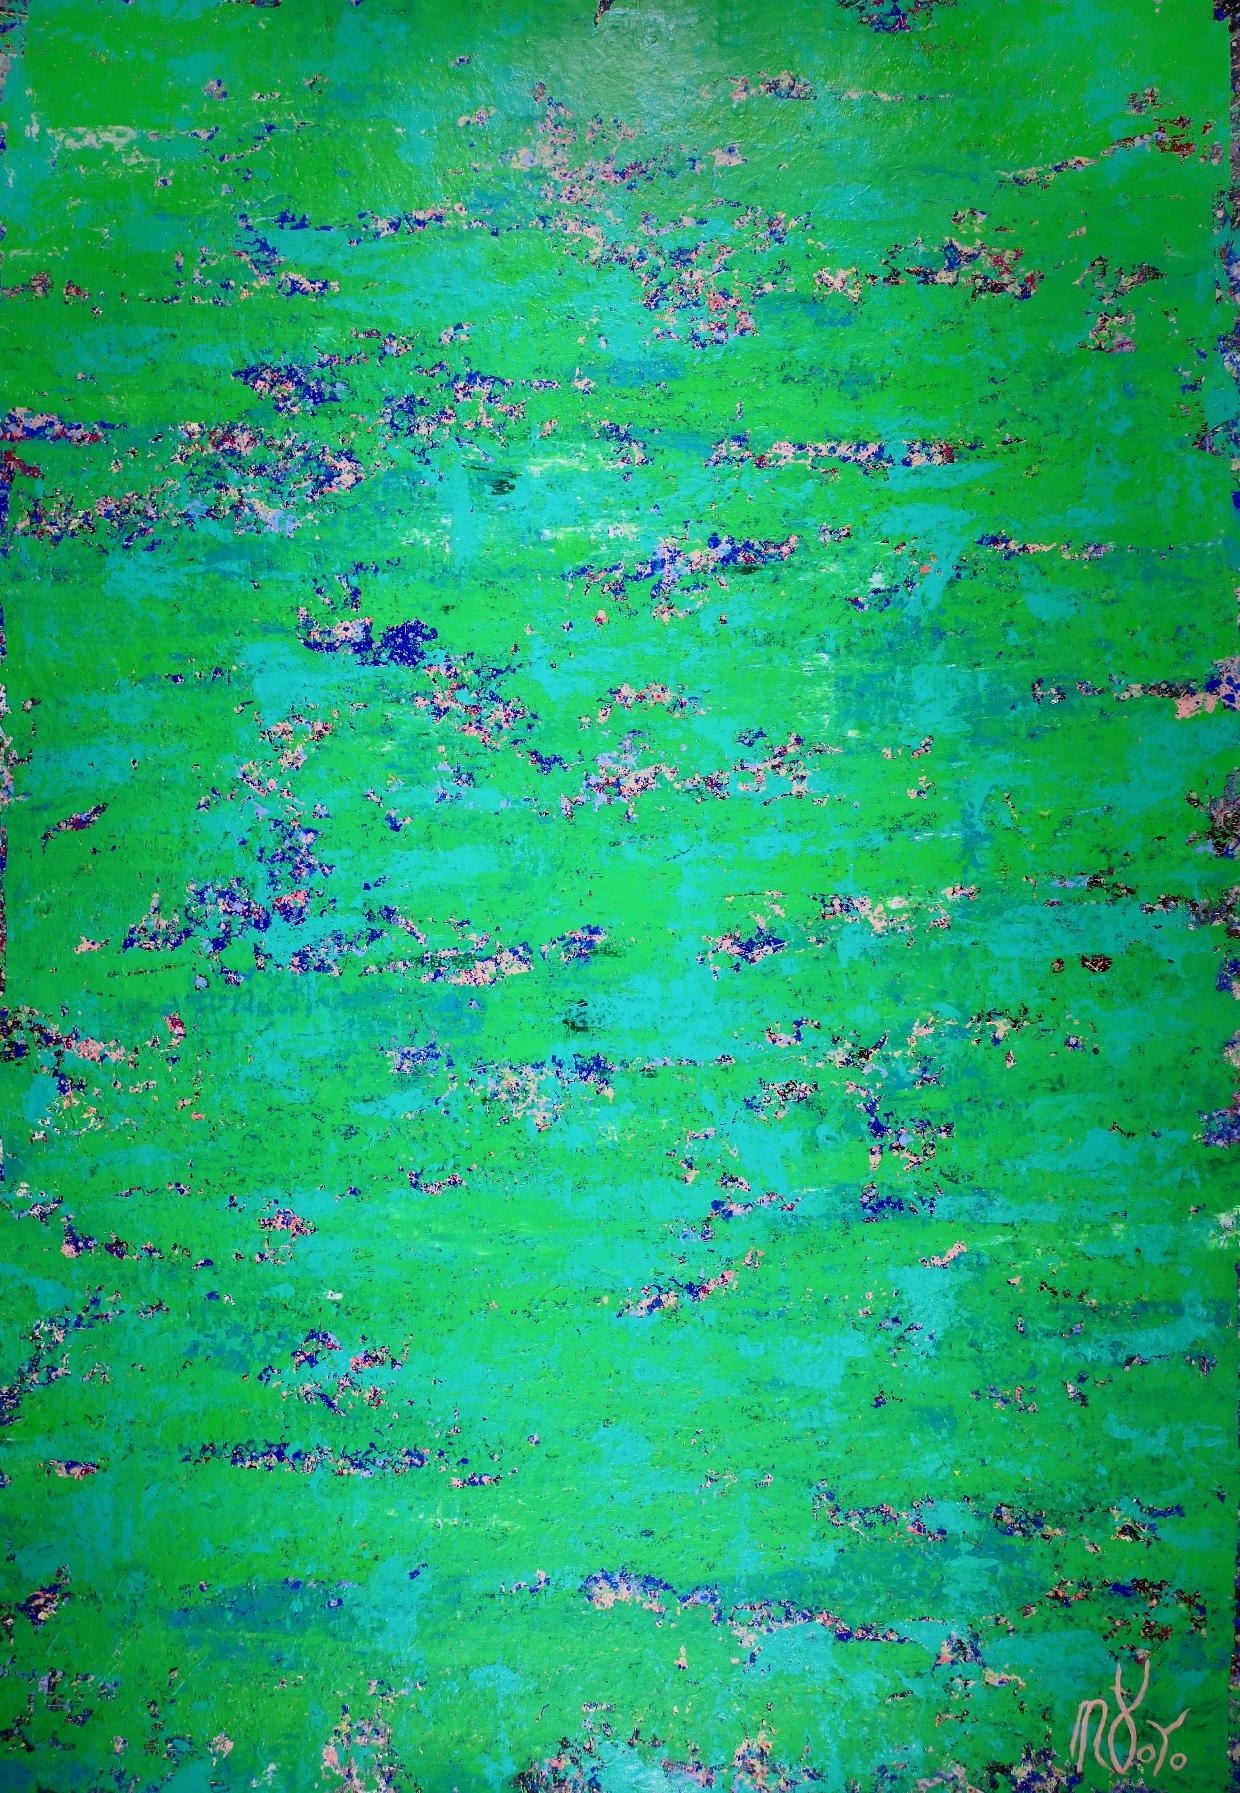 Full Image / Emerald Spectra by Nestor Toro (2019) 70 x 48 inches